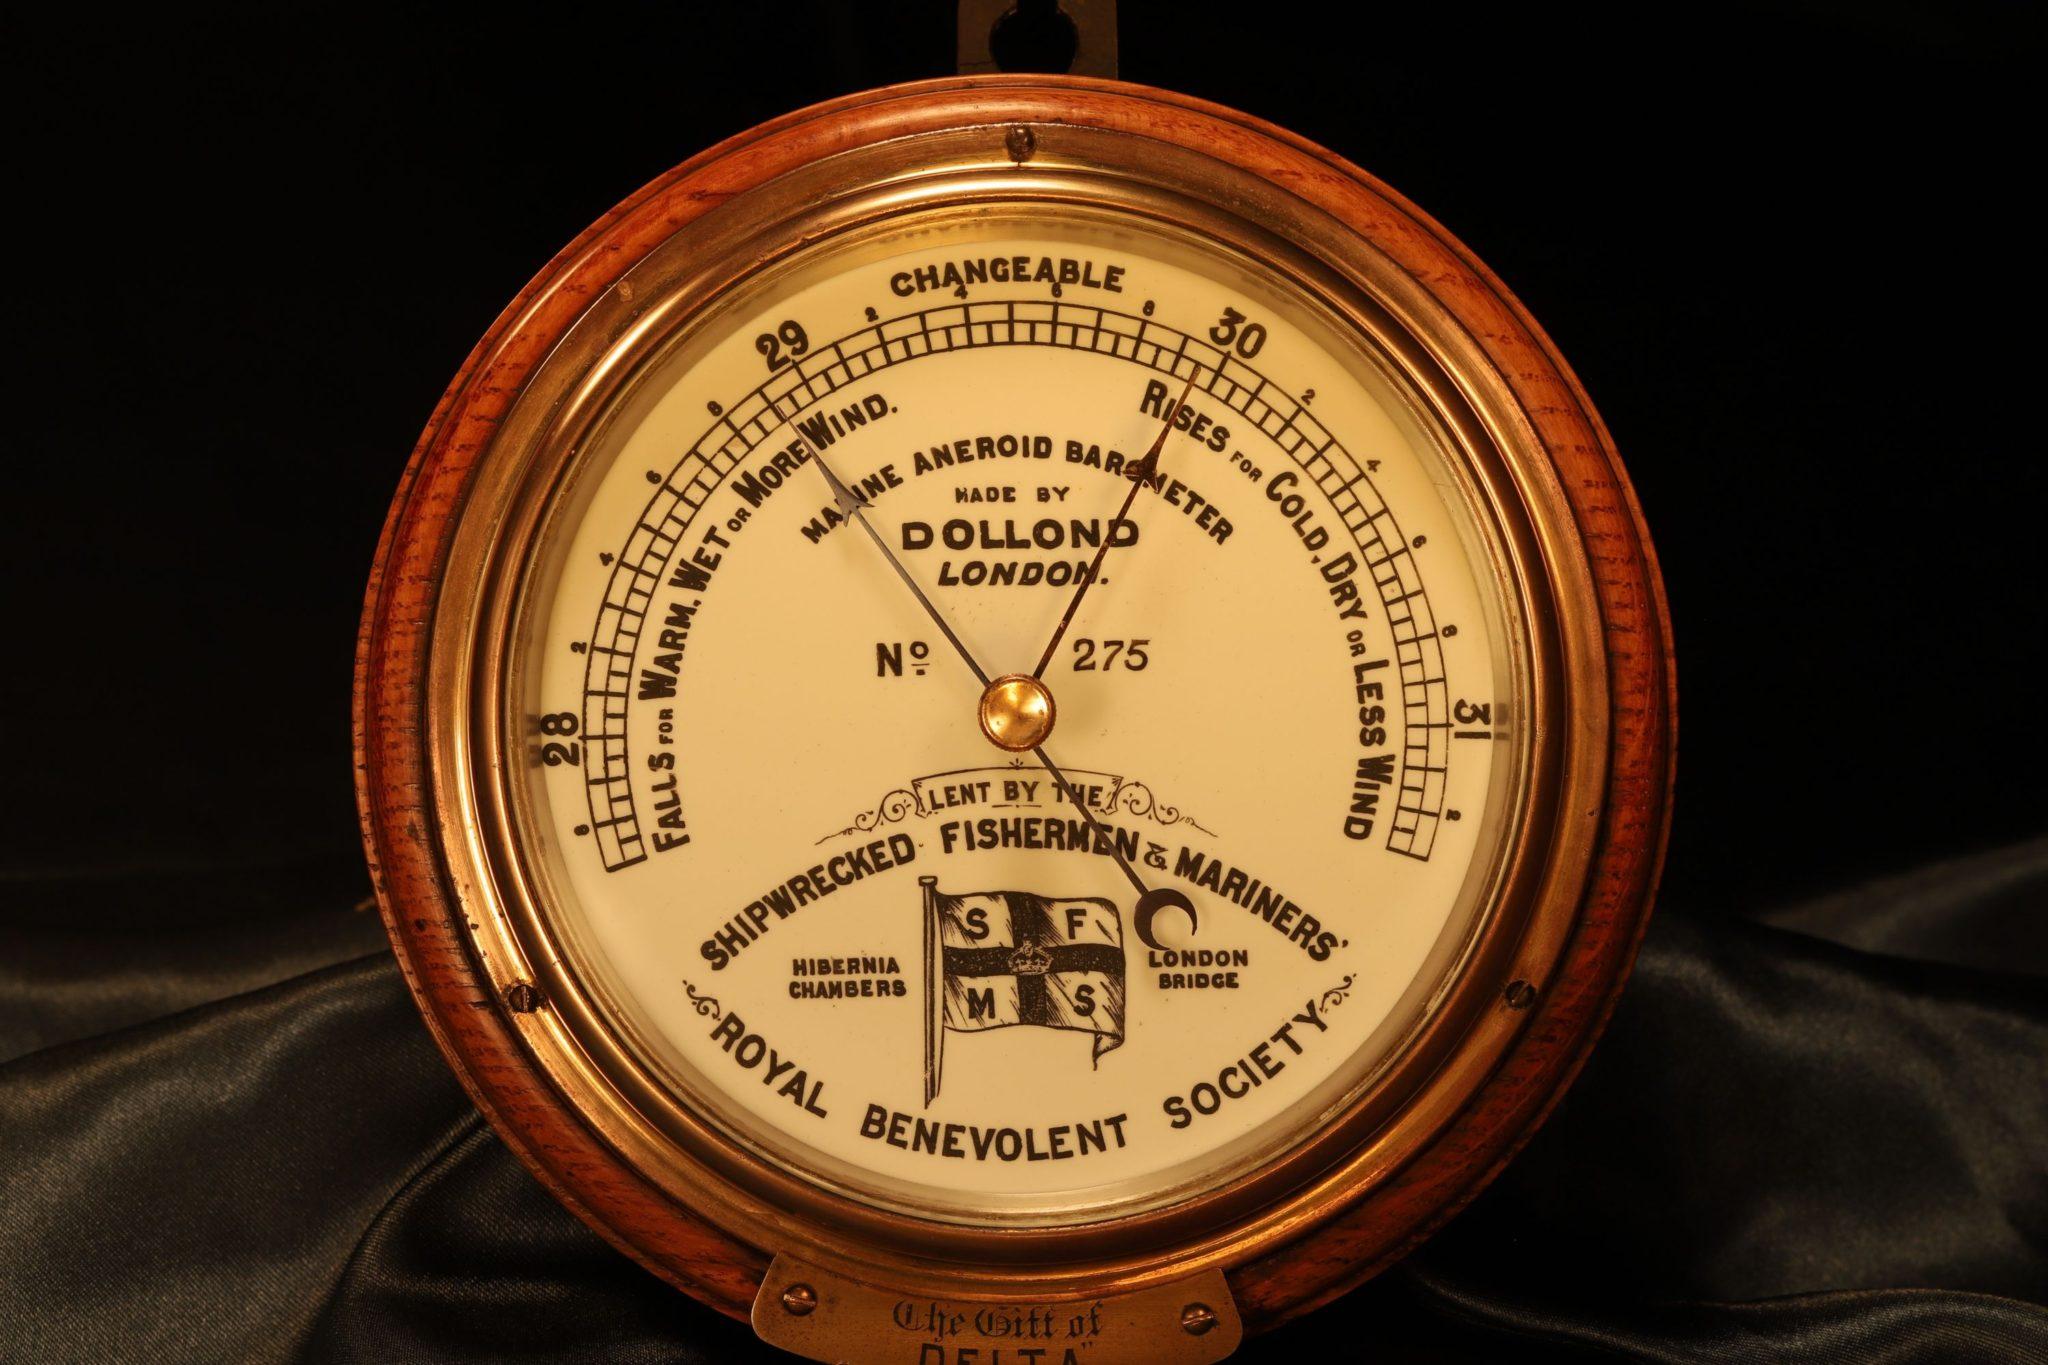 Image of Dollond Shipwrecked Fishermen & Mariners Society Marine Barometer No 275 c1882